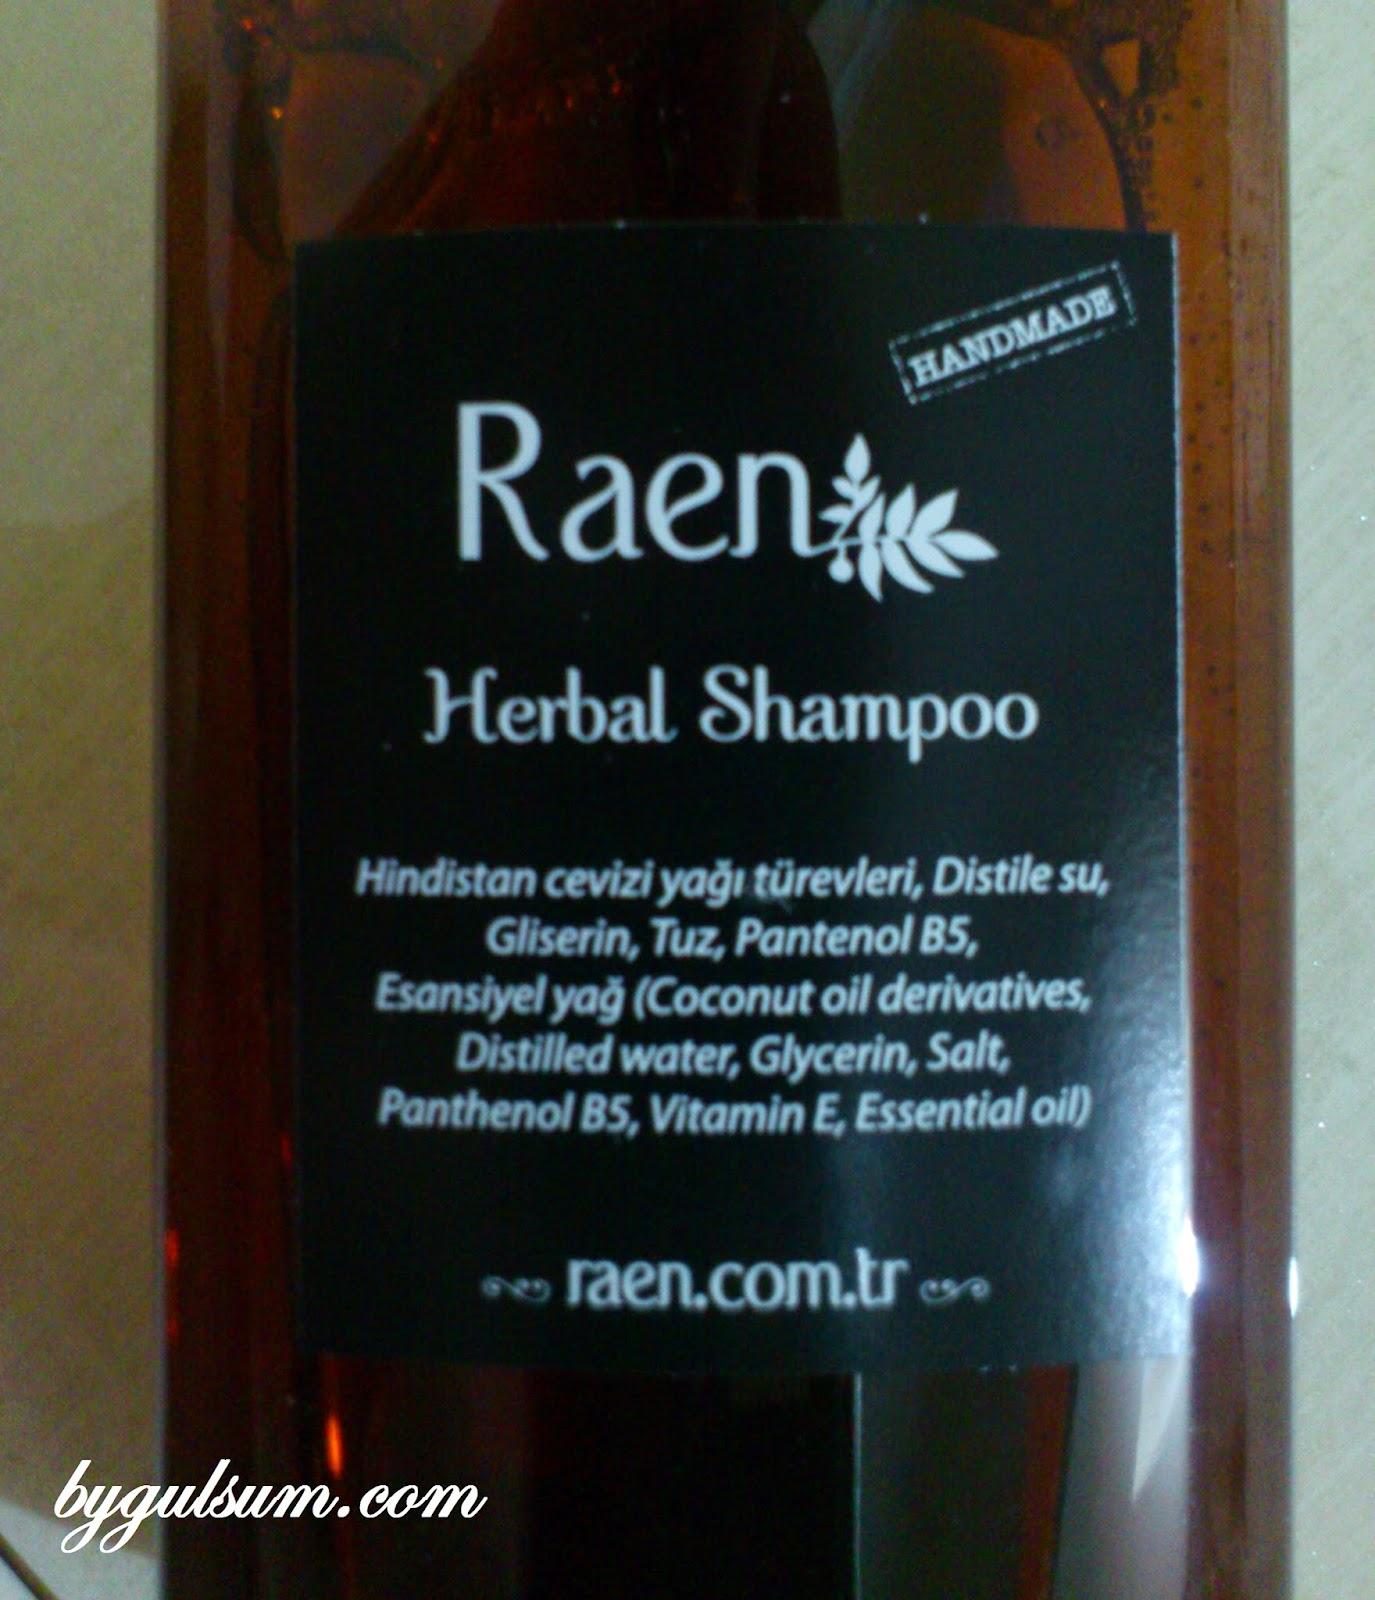 Raen Shampoo